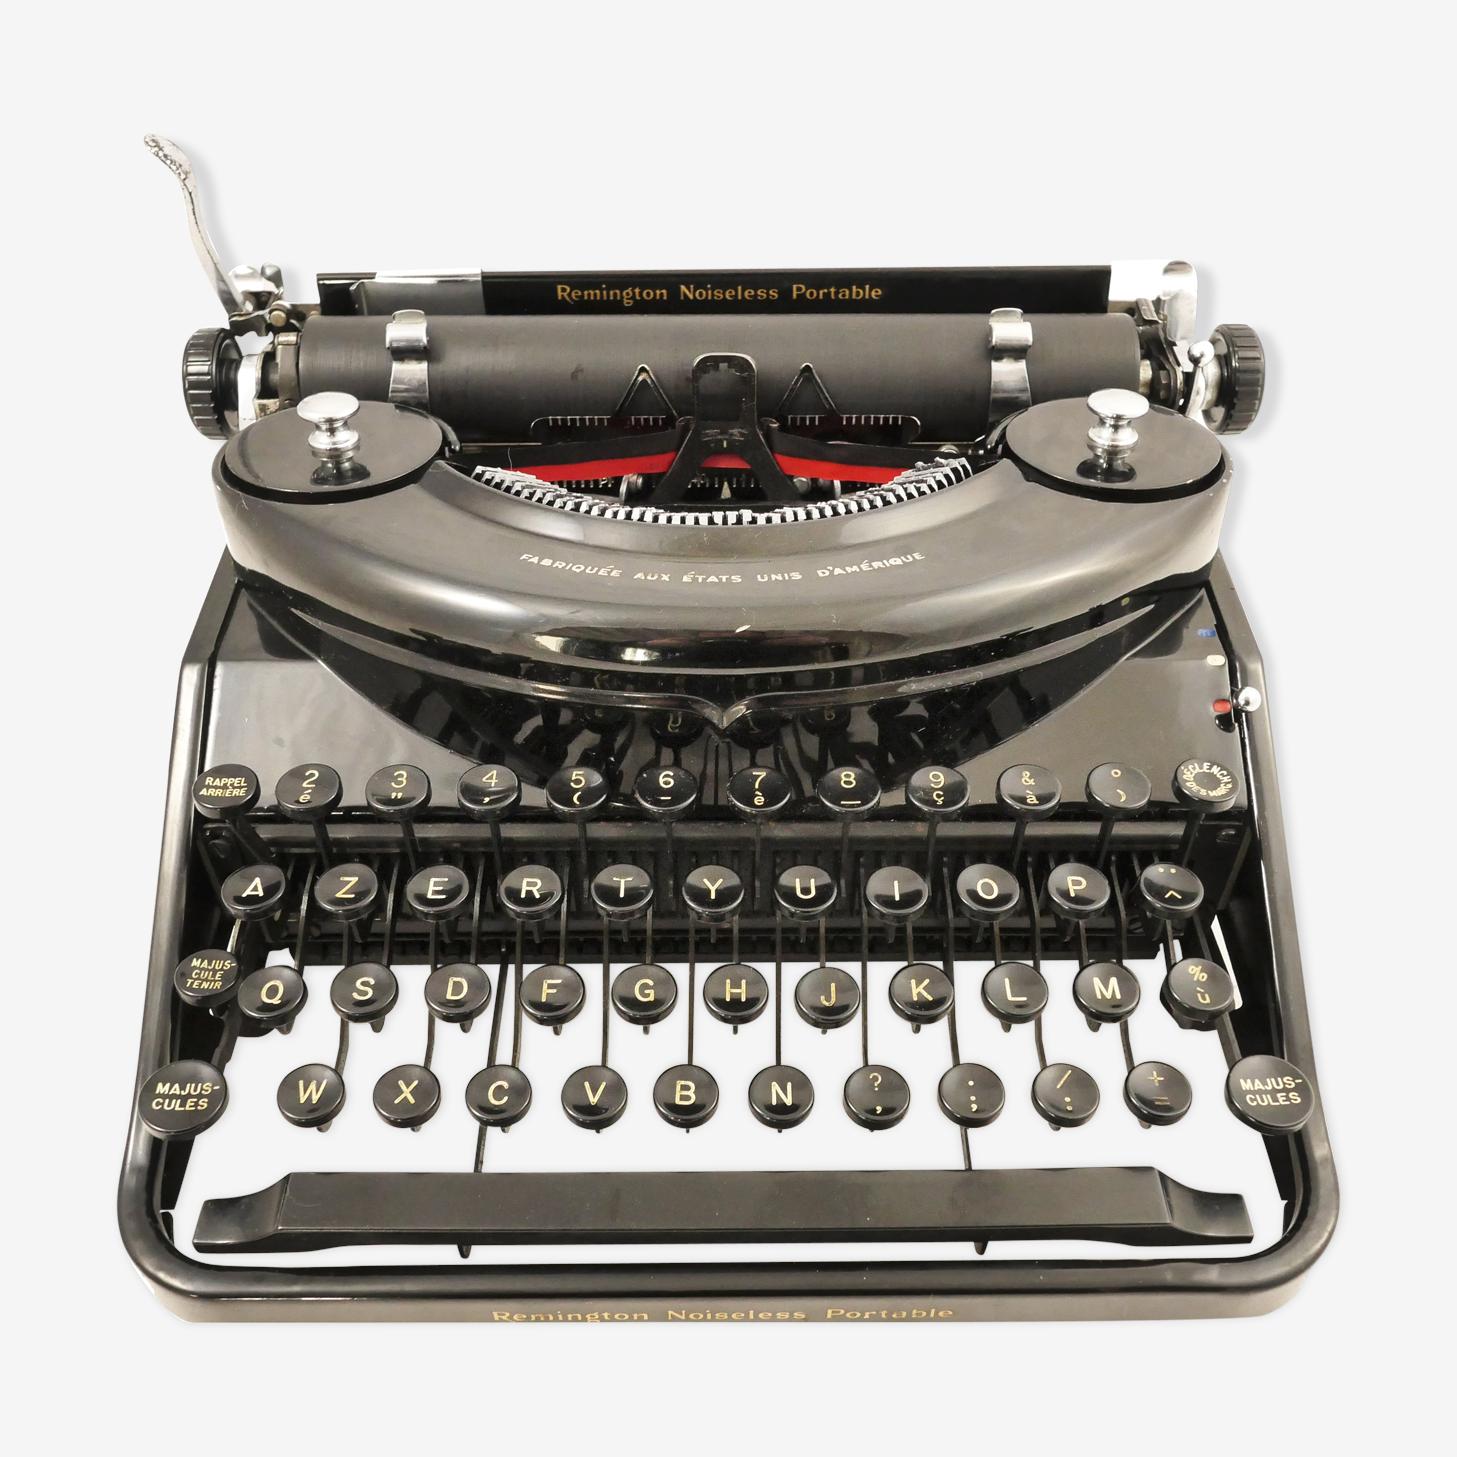 Typewriter Remington Noiseless portable black of 1935 revised nine Ribbon